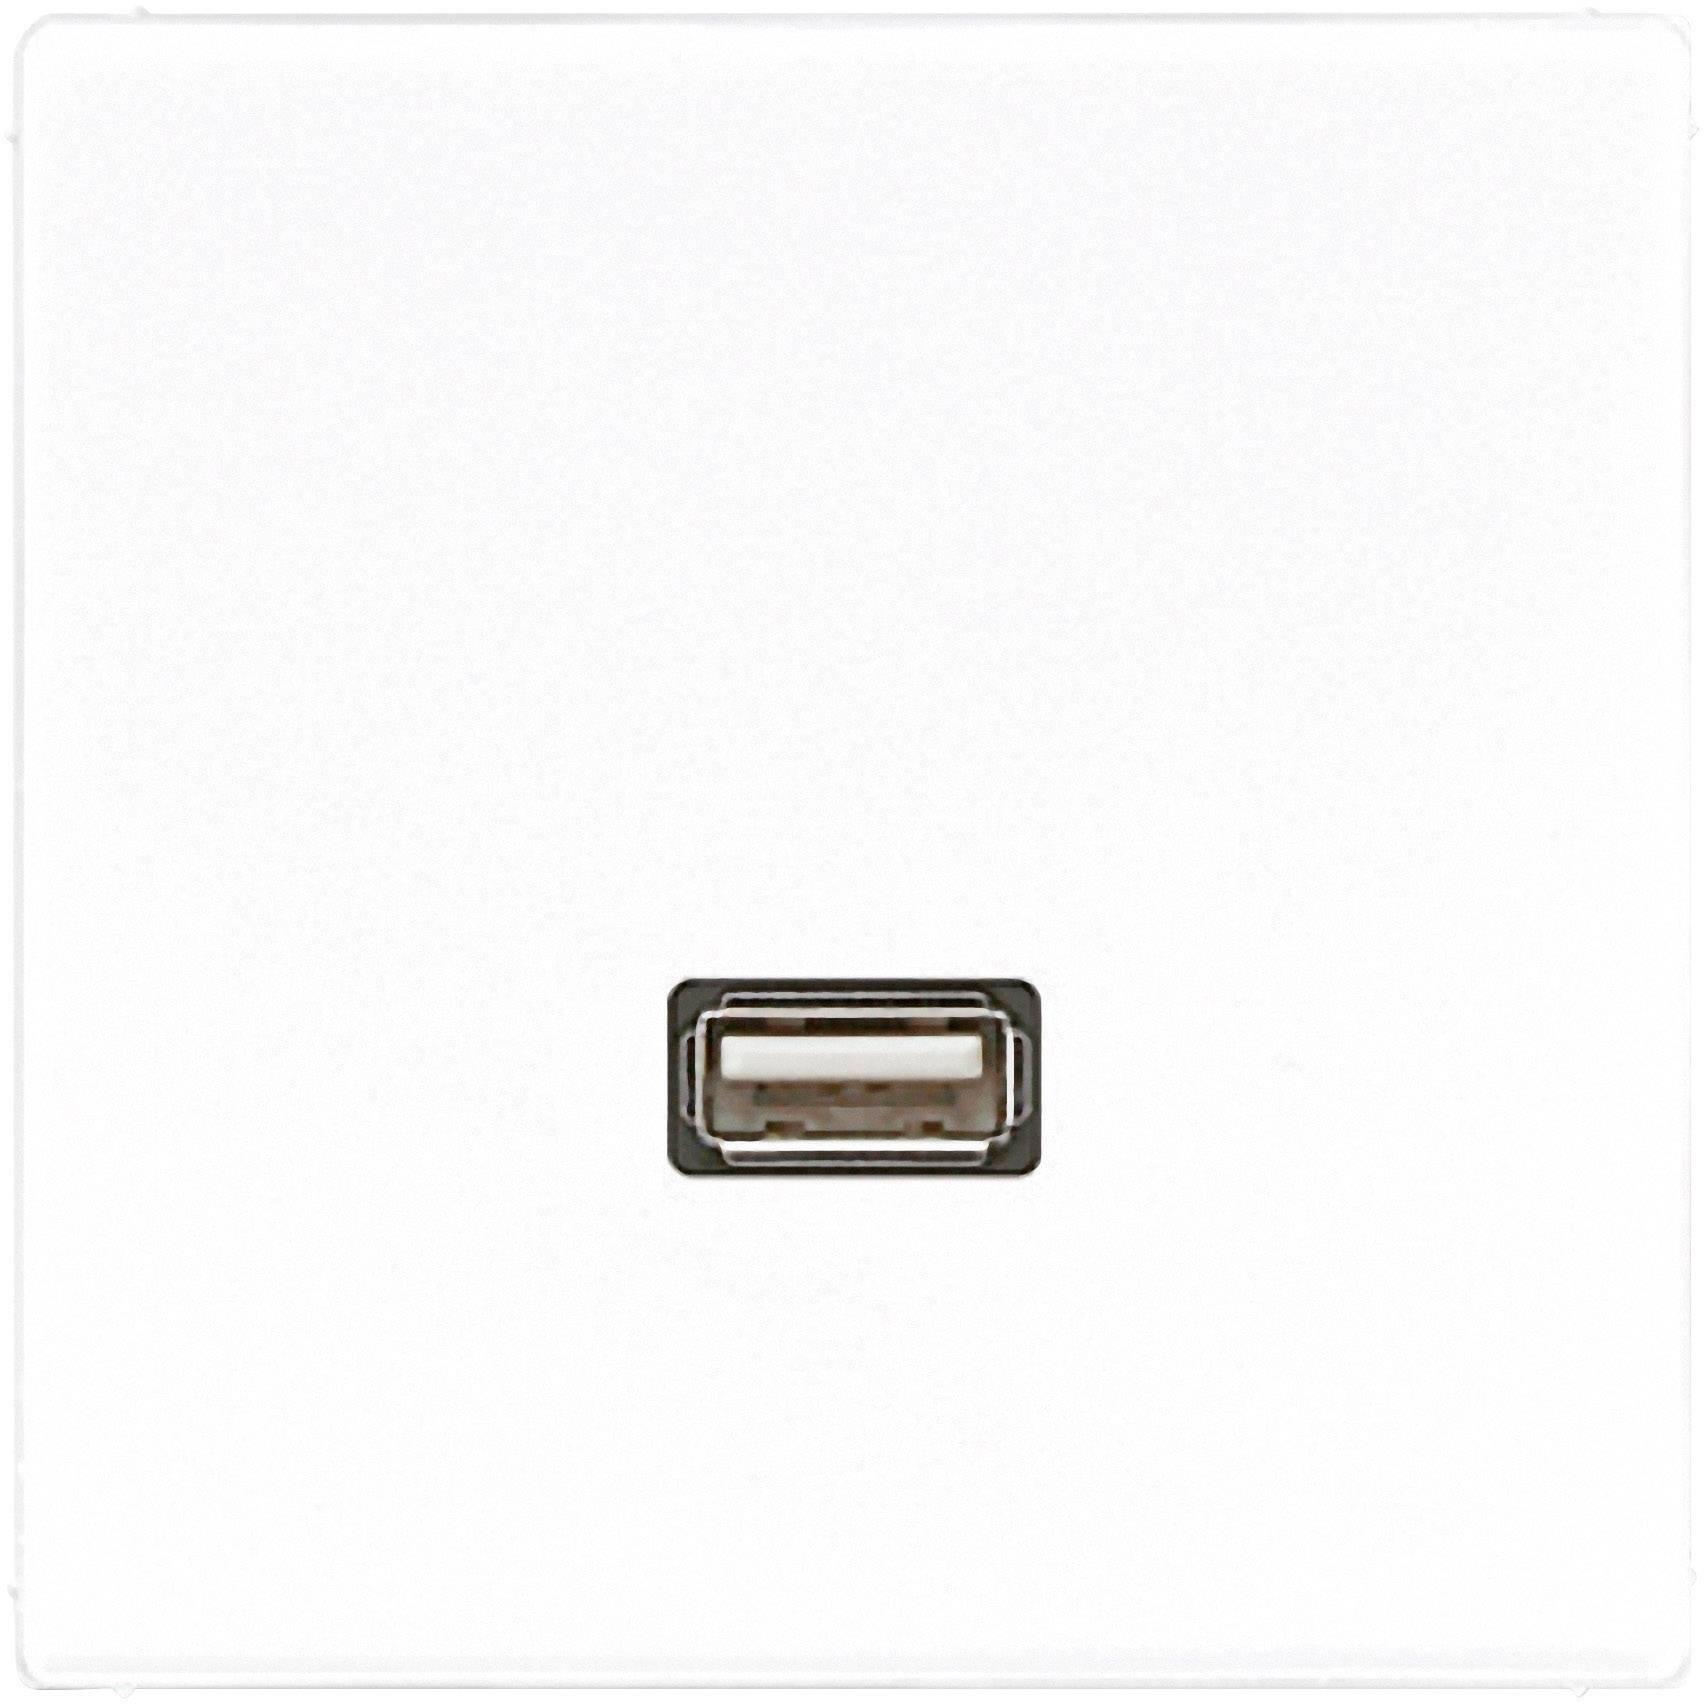 Jung Einsatz USB-Steckdose LS 990, LS design, LS plus Alpinweiß MALS1122WW